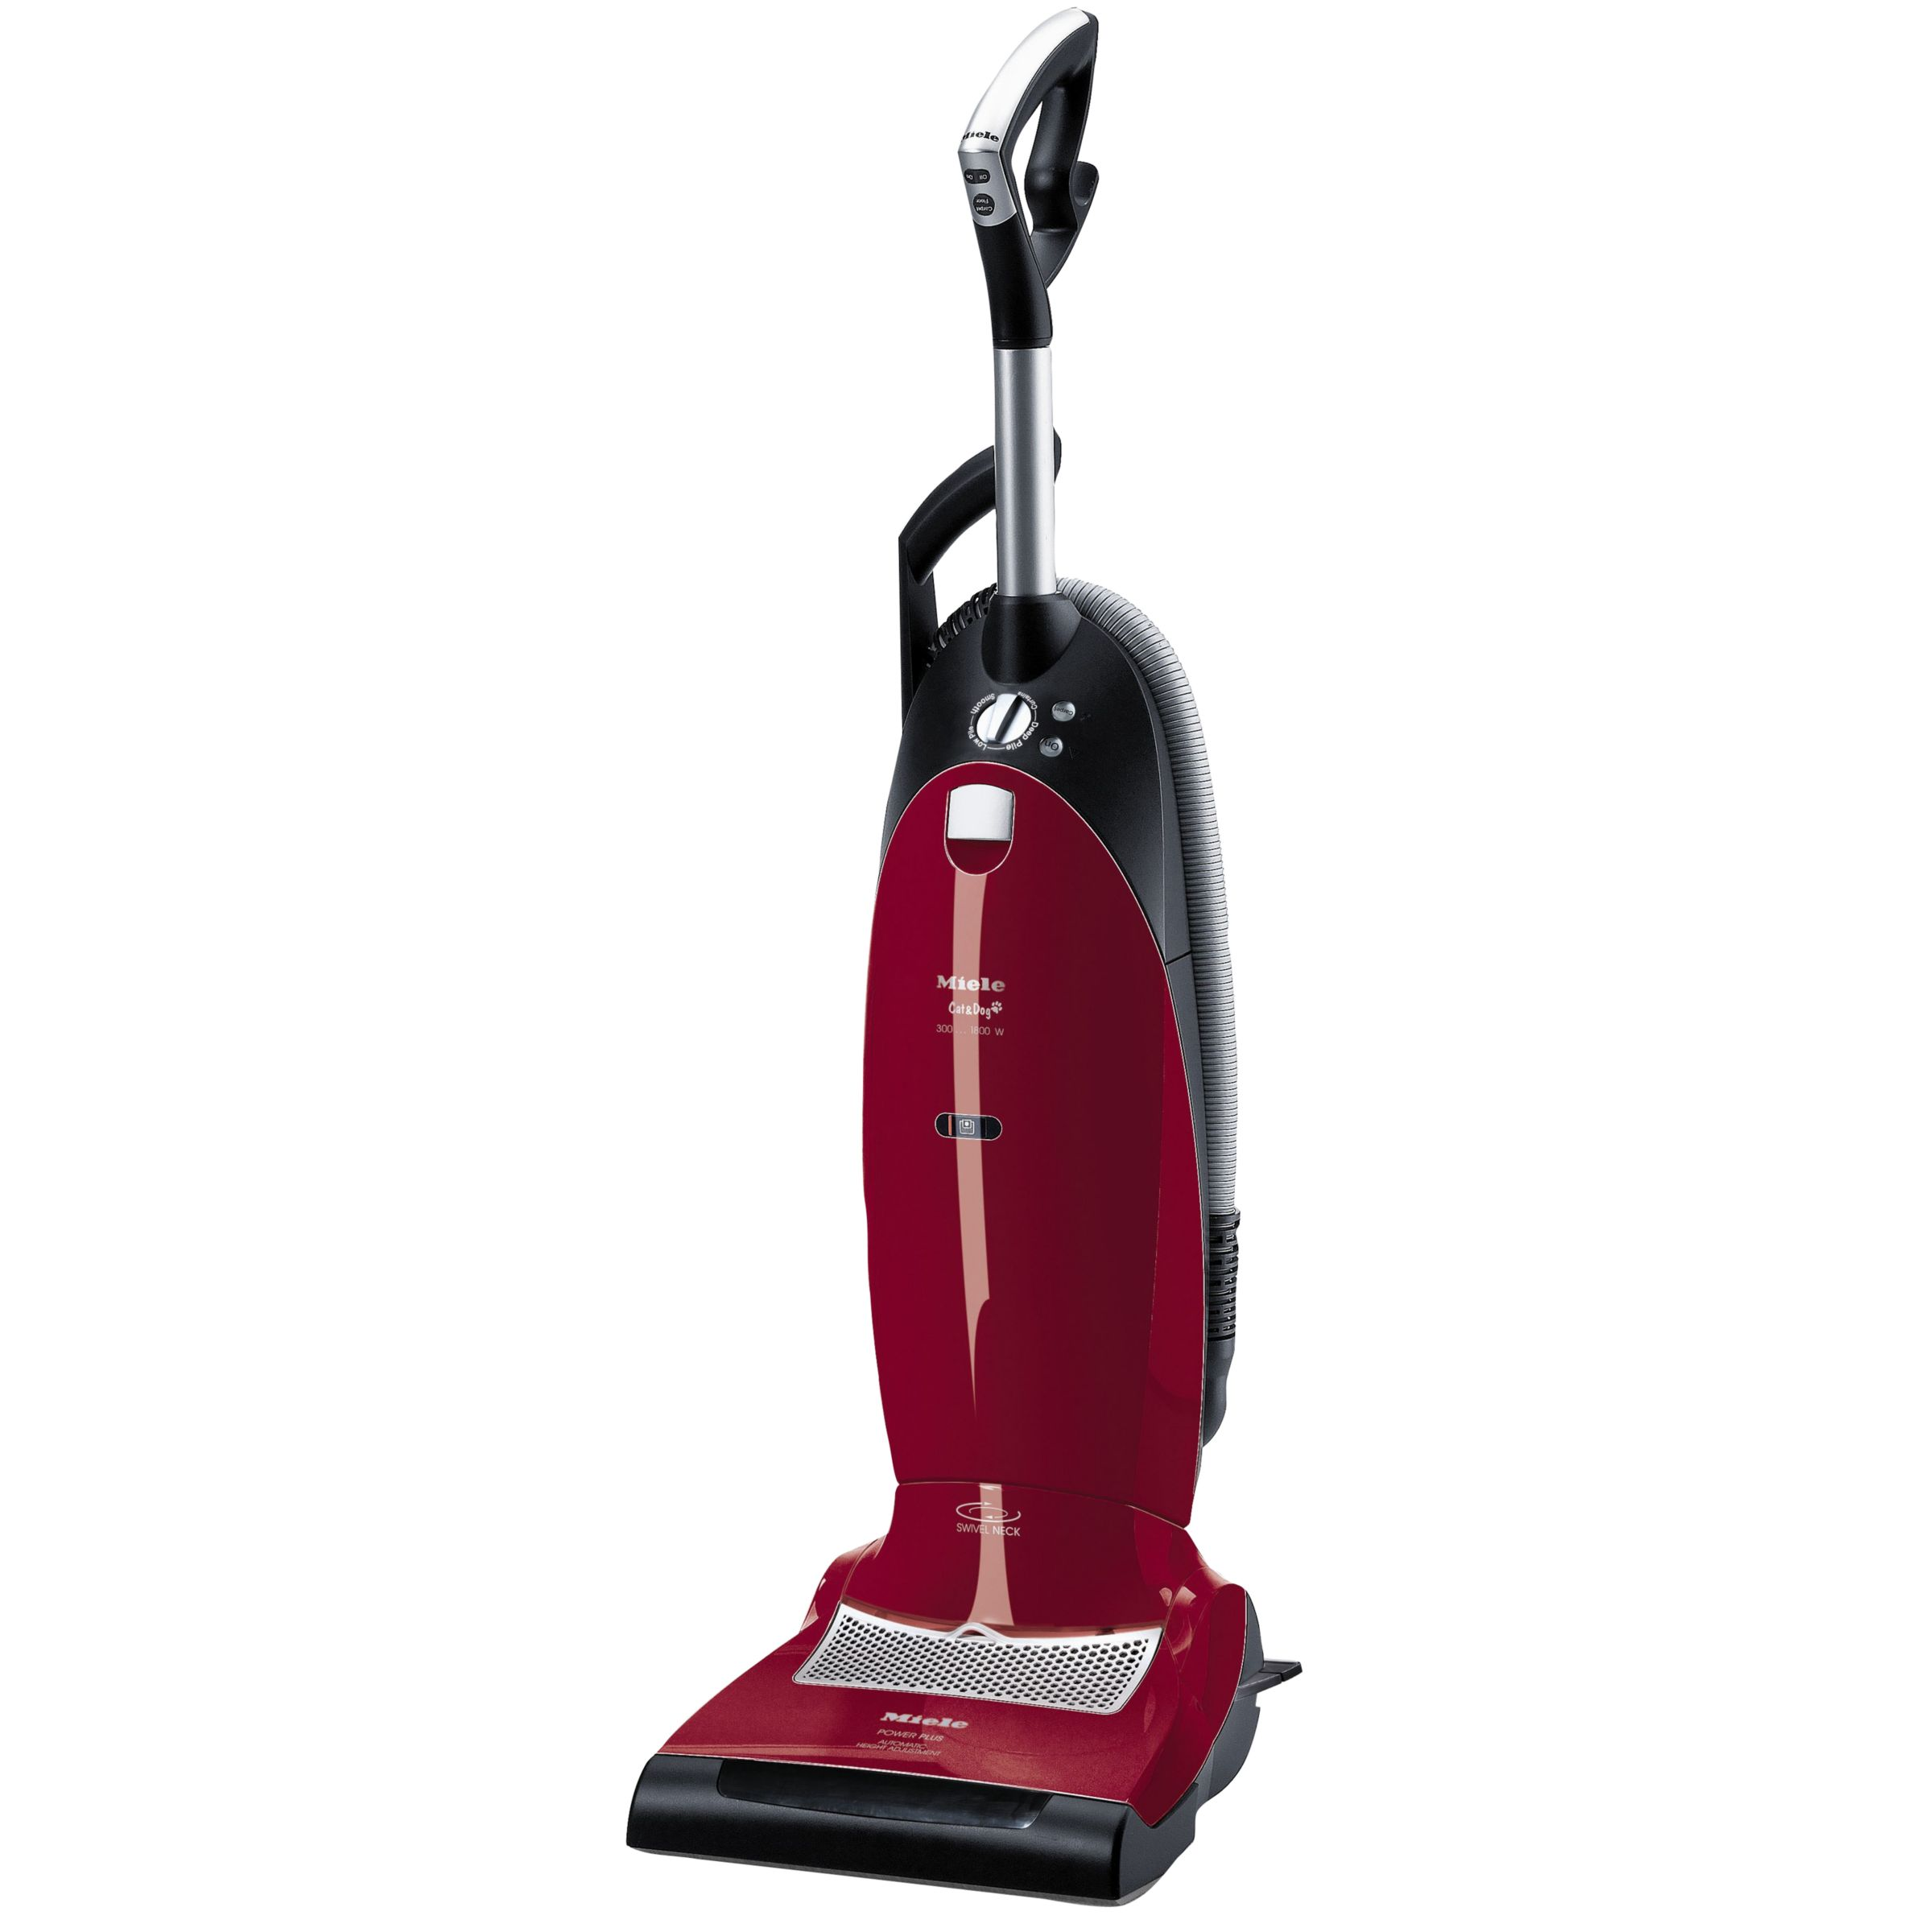 Dog Upright Vacuum Cleaner S7260 1800w